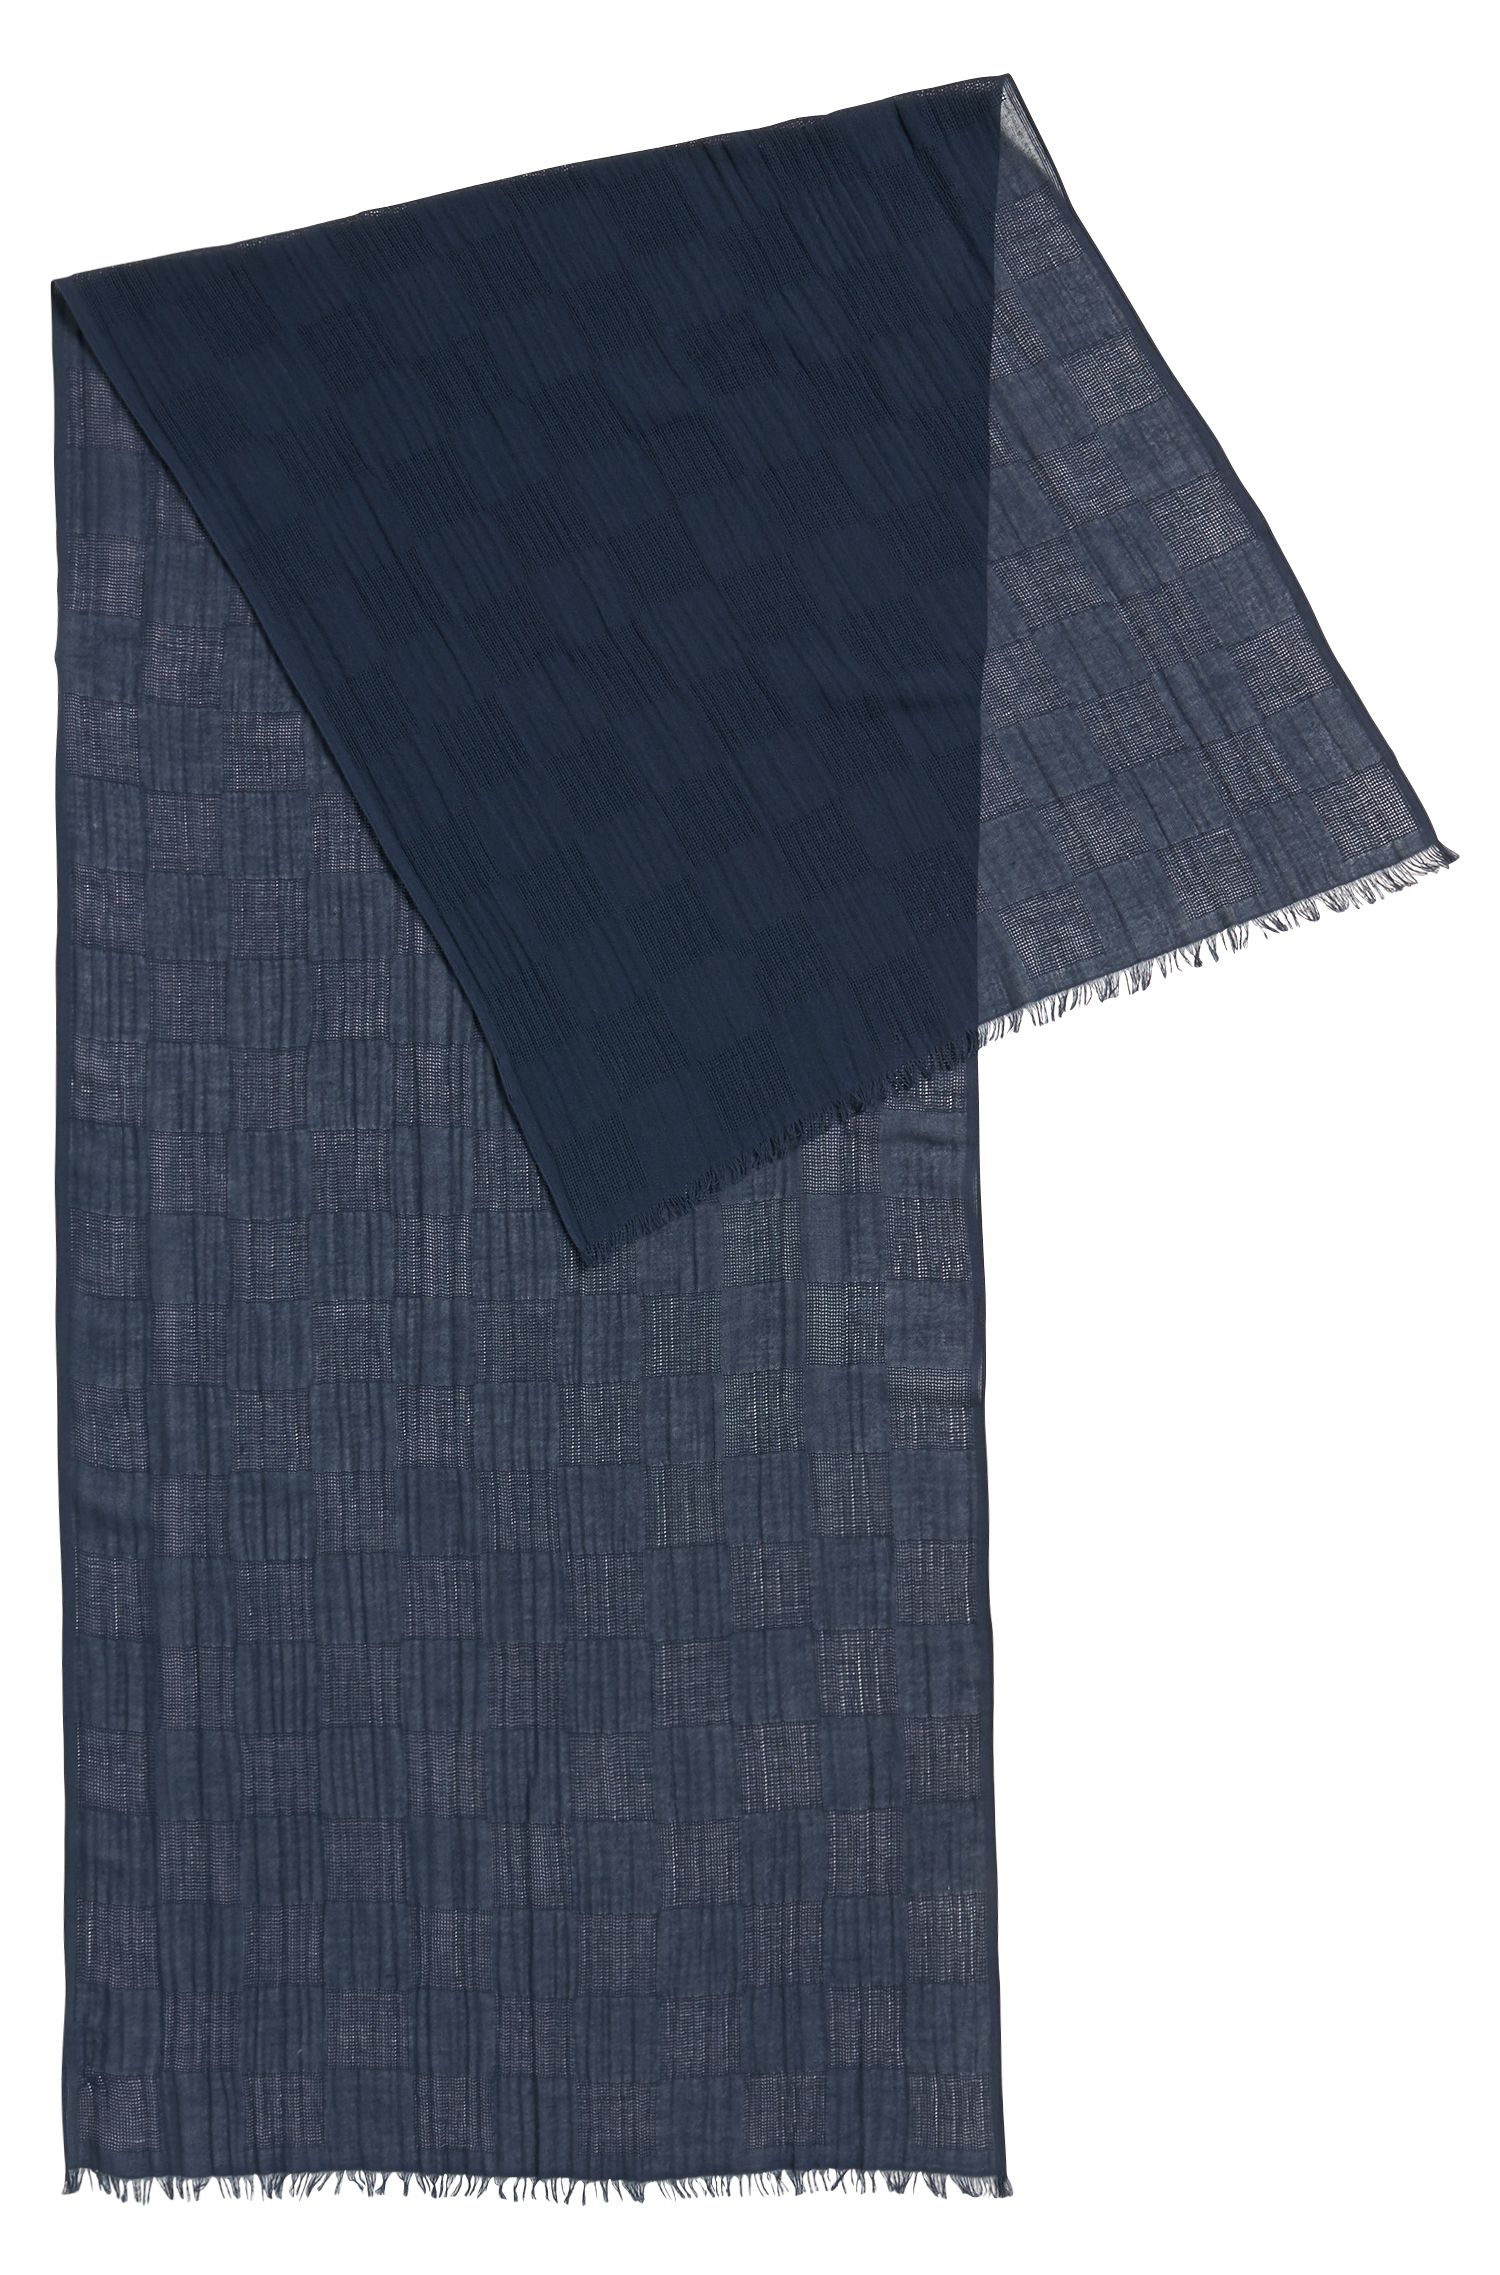 Karierter Schal aus leichtemBaumwoll-Jacquard